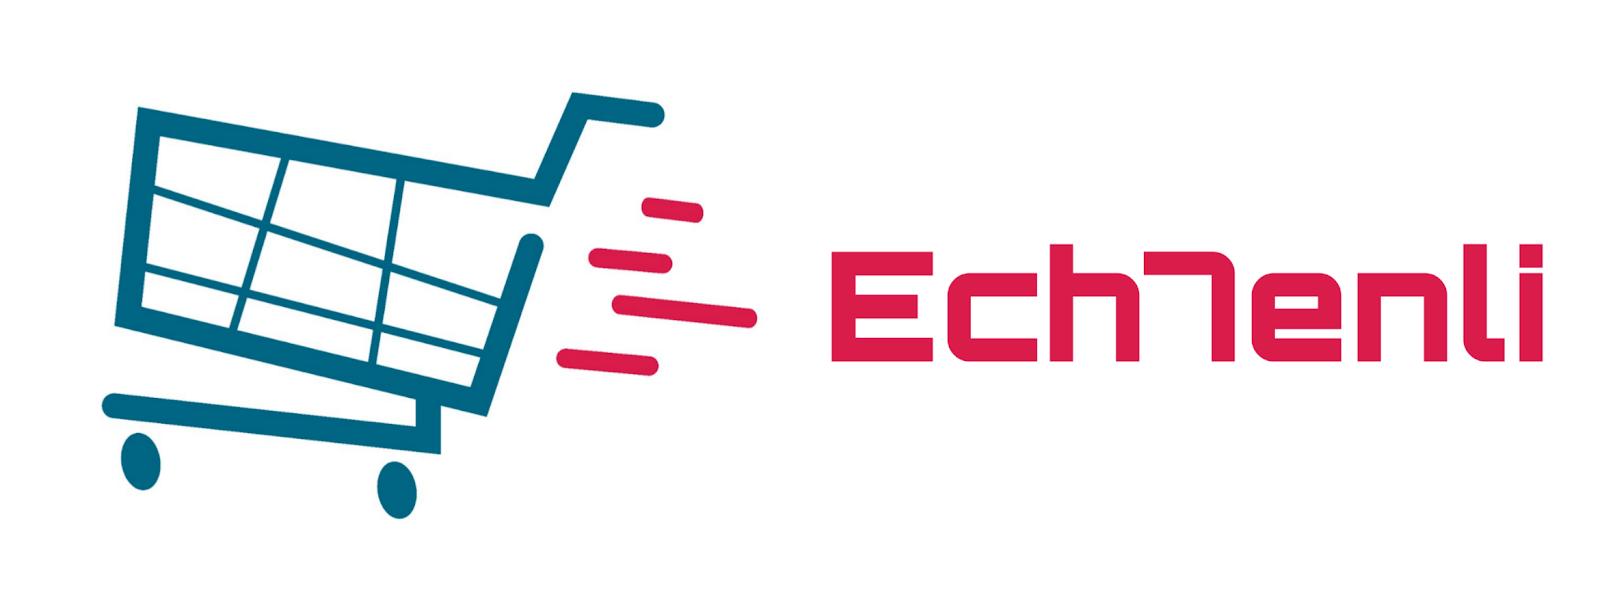 Ech7enli - اشحنلي